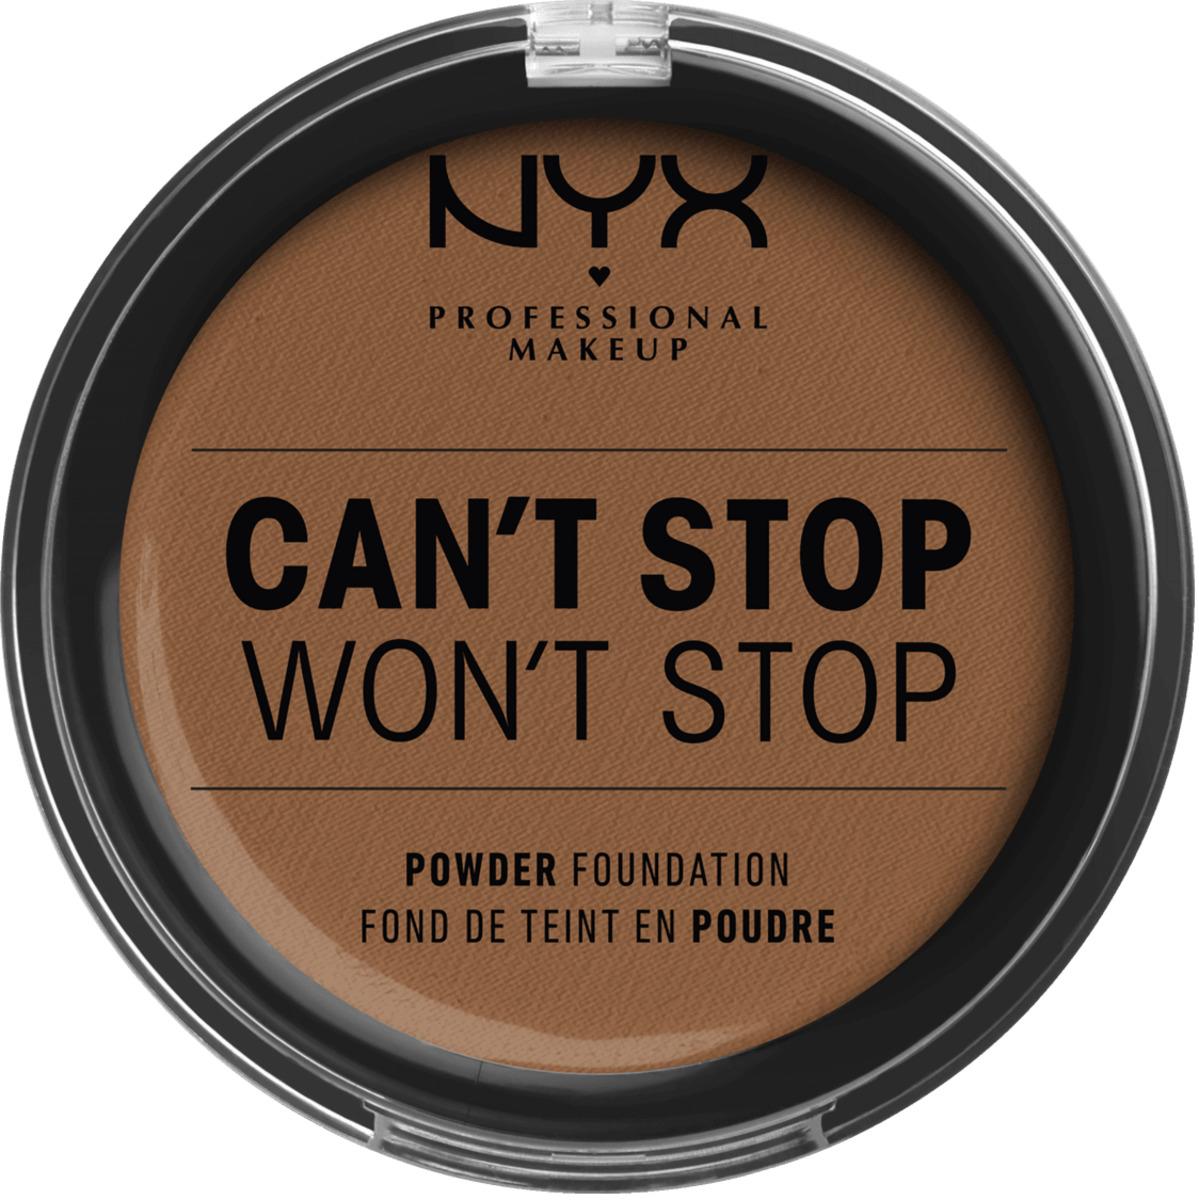 Bild 1 von NYX PROFESSIONAL MAKEUP Foundation Can't Stop Won't Stop Full Coverage Powder Foundation Cappuchino 17